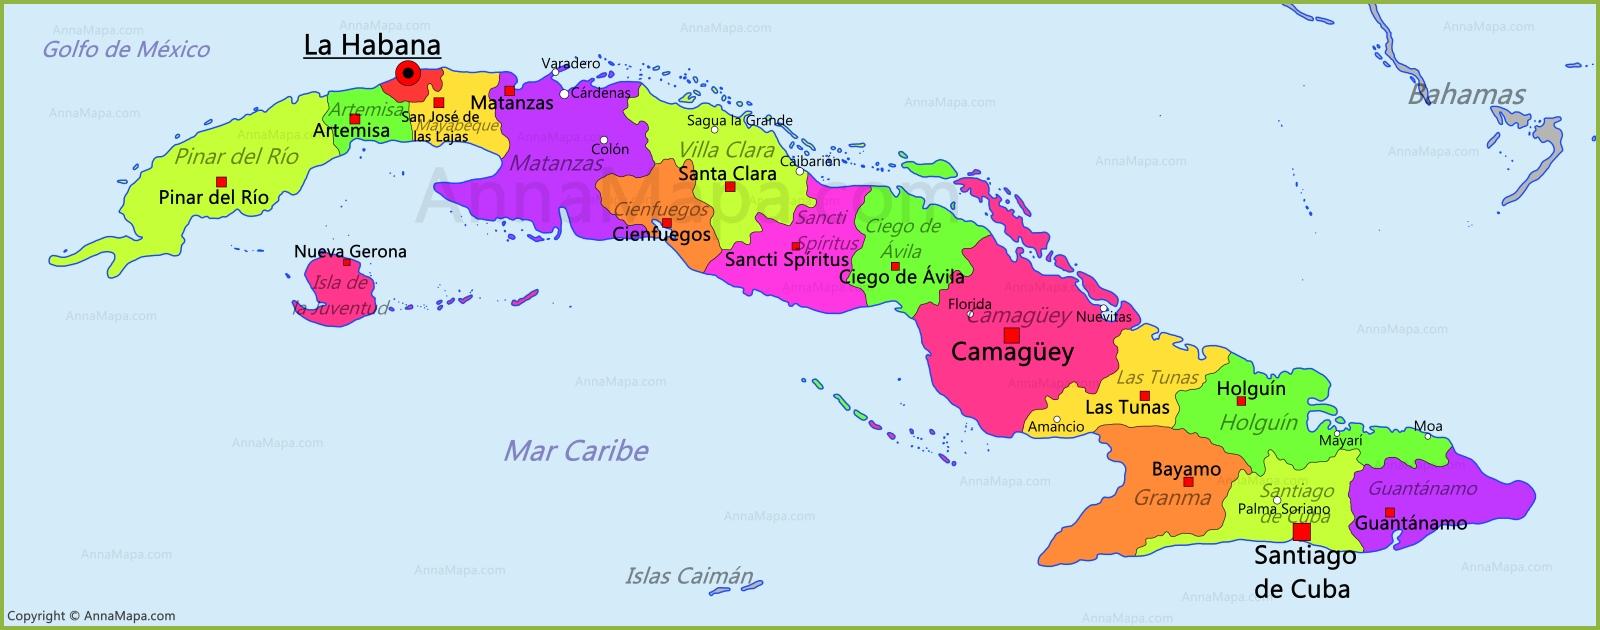 mapa de cuba Mapa de Cuba   AnnaMapa.com mapa de cuba